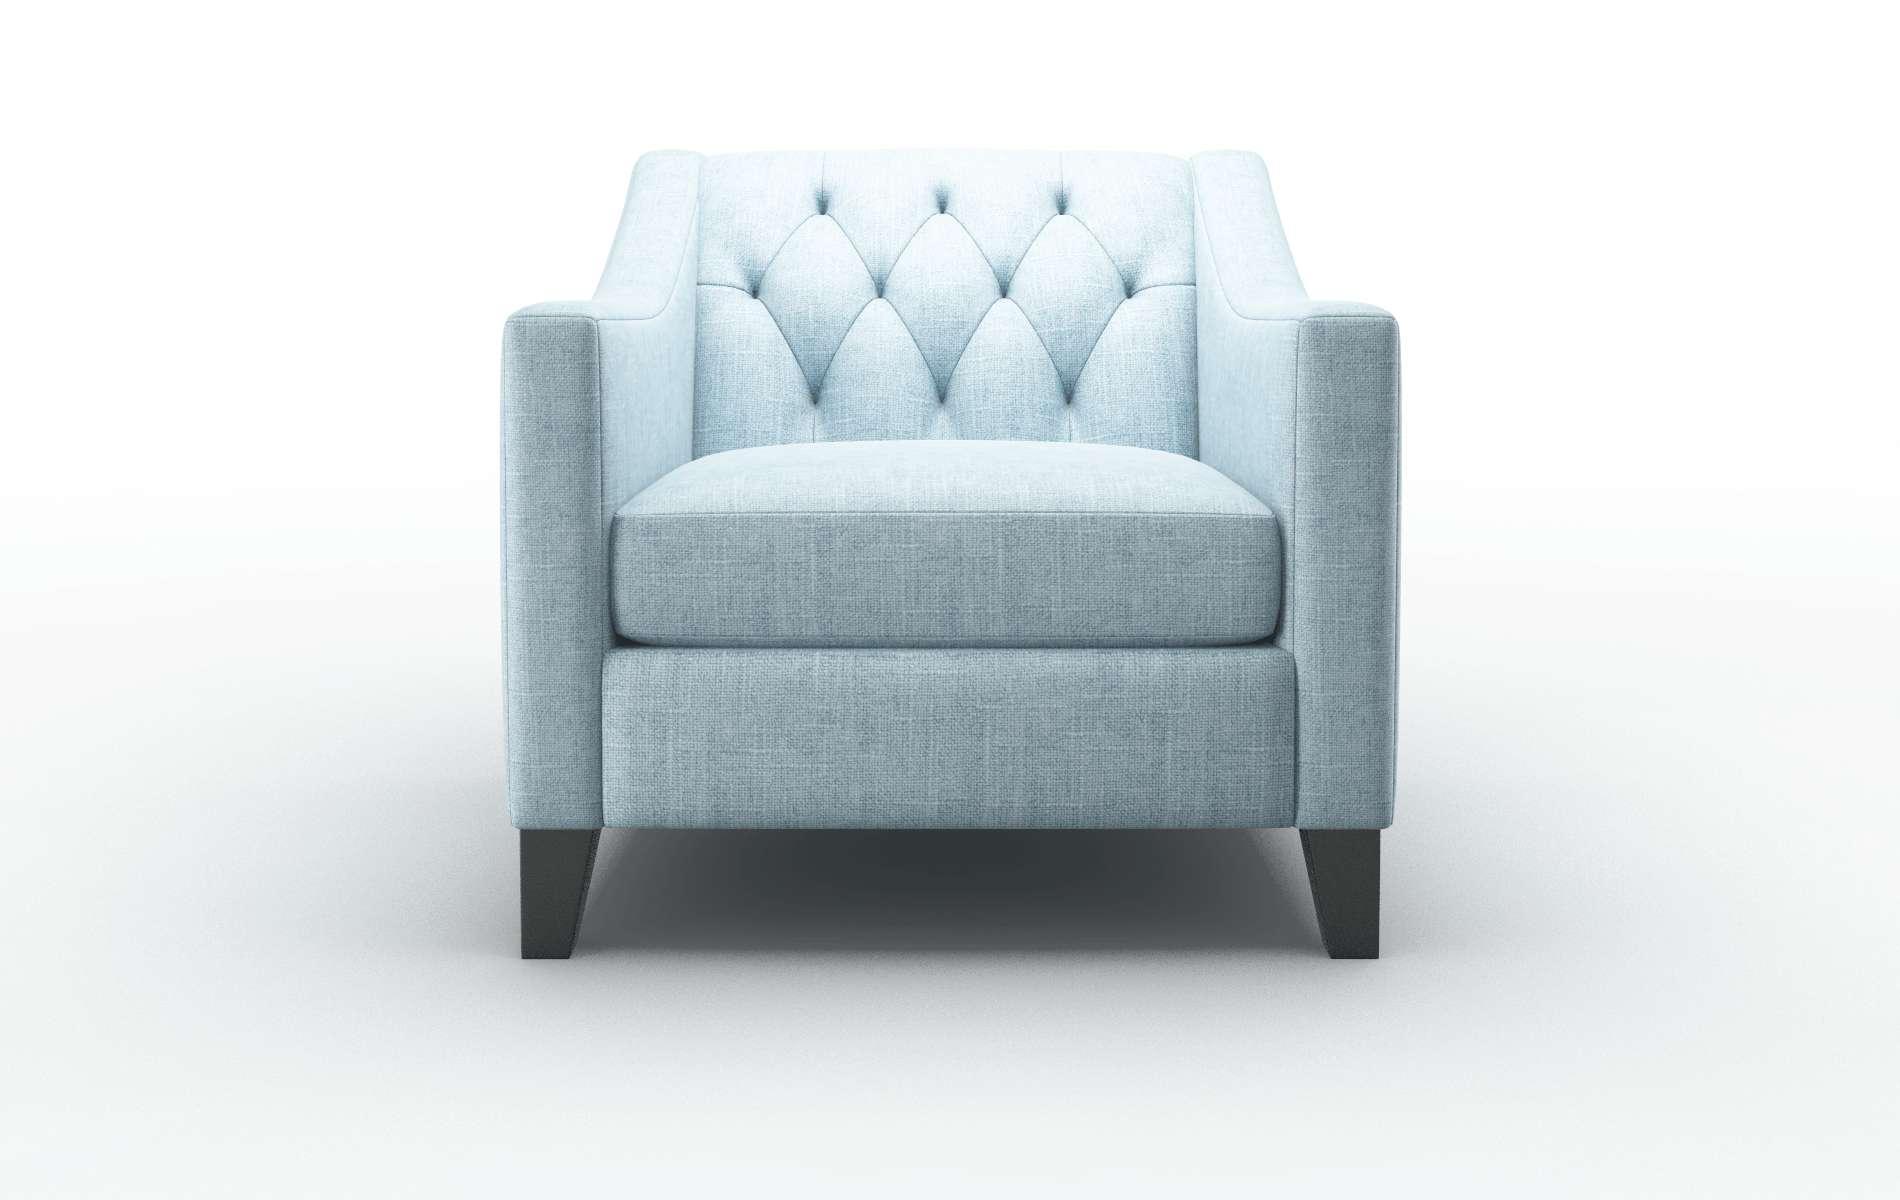 Seville Atlas Turquoise Chair espresso legs 1